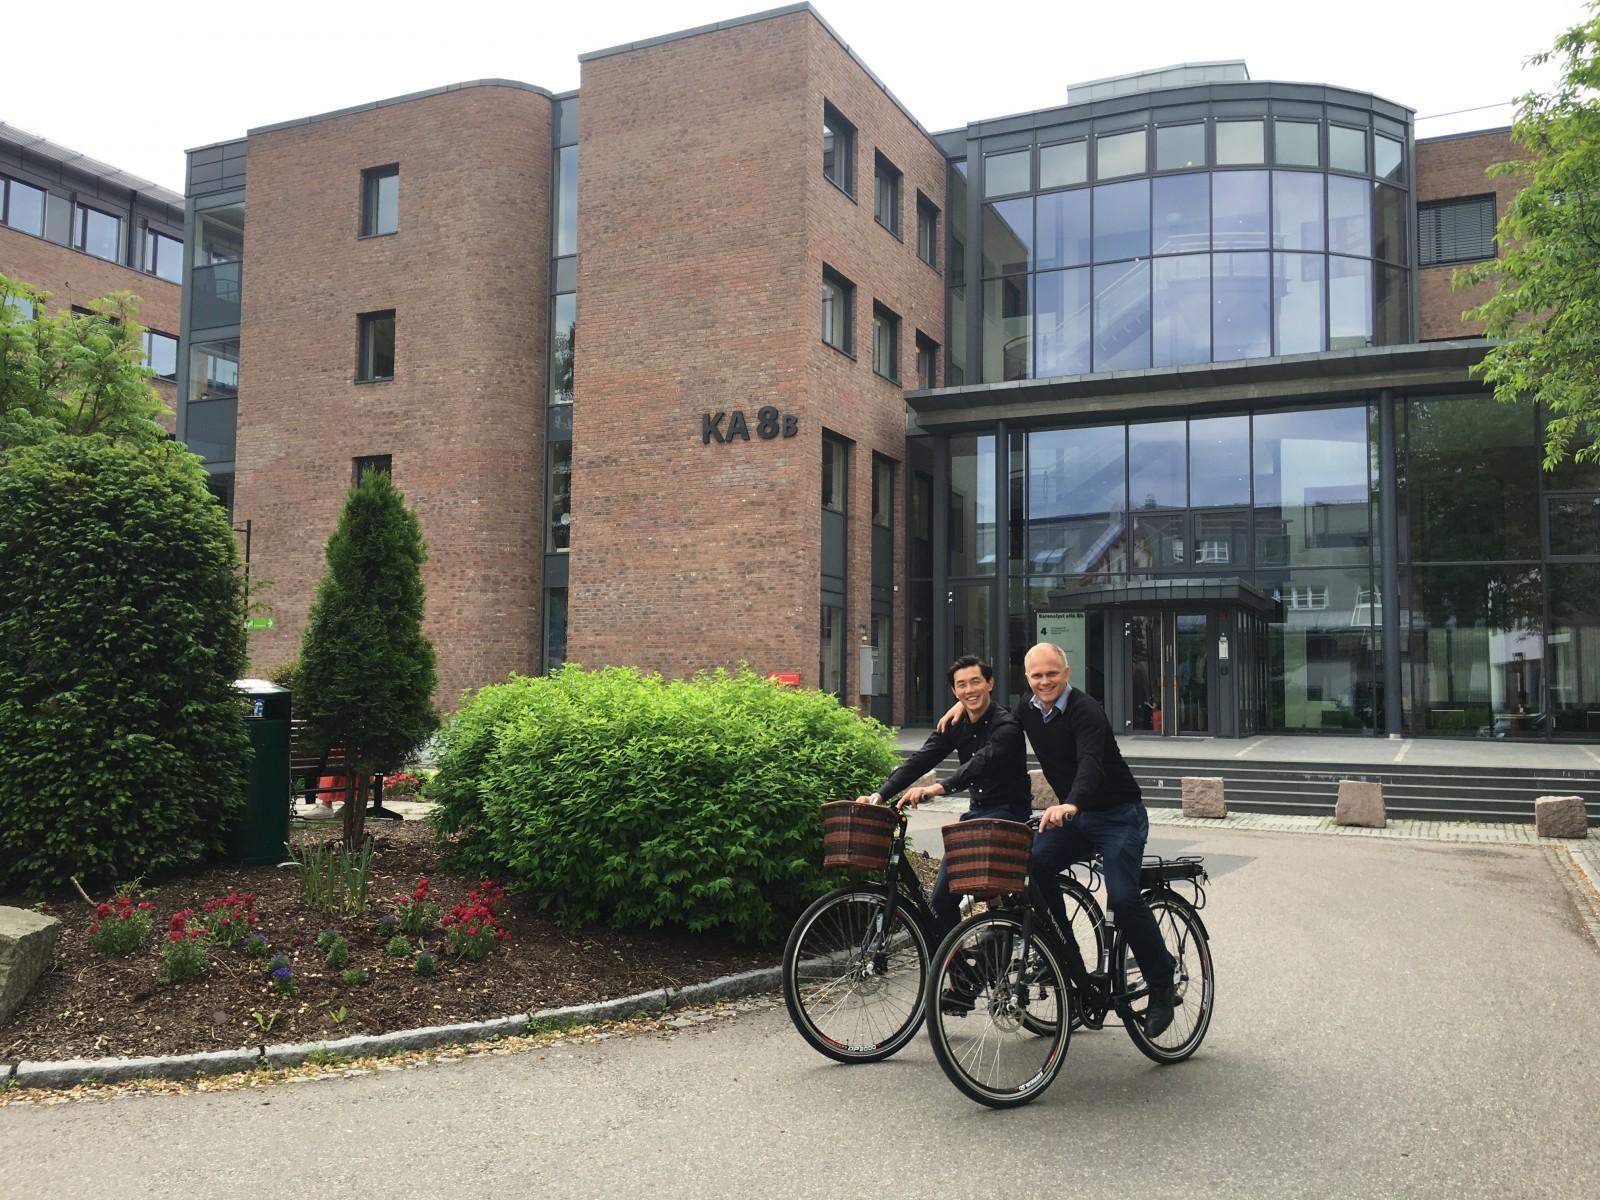 EL sykler juni16-2